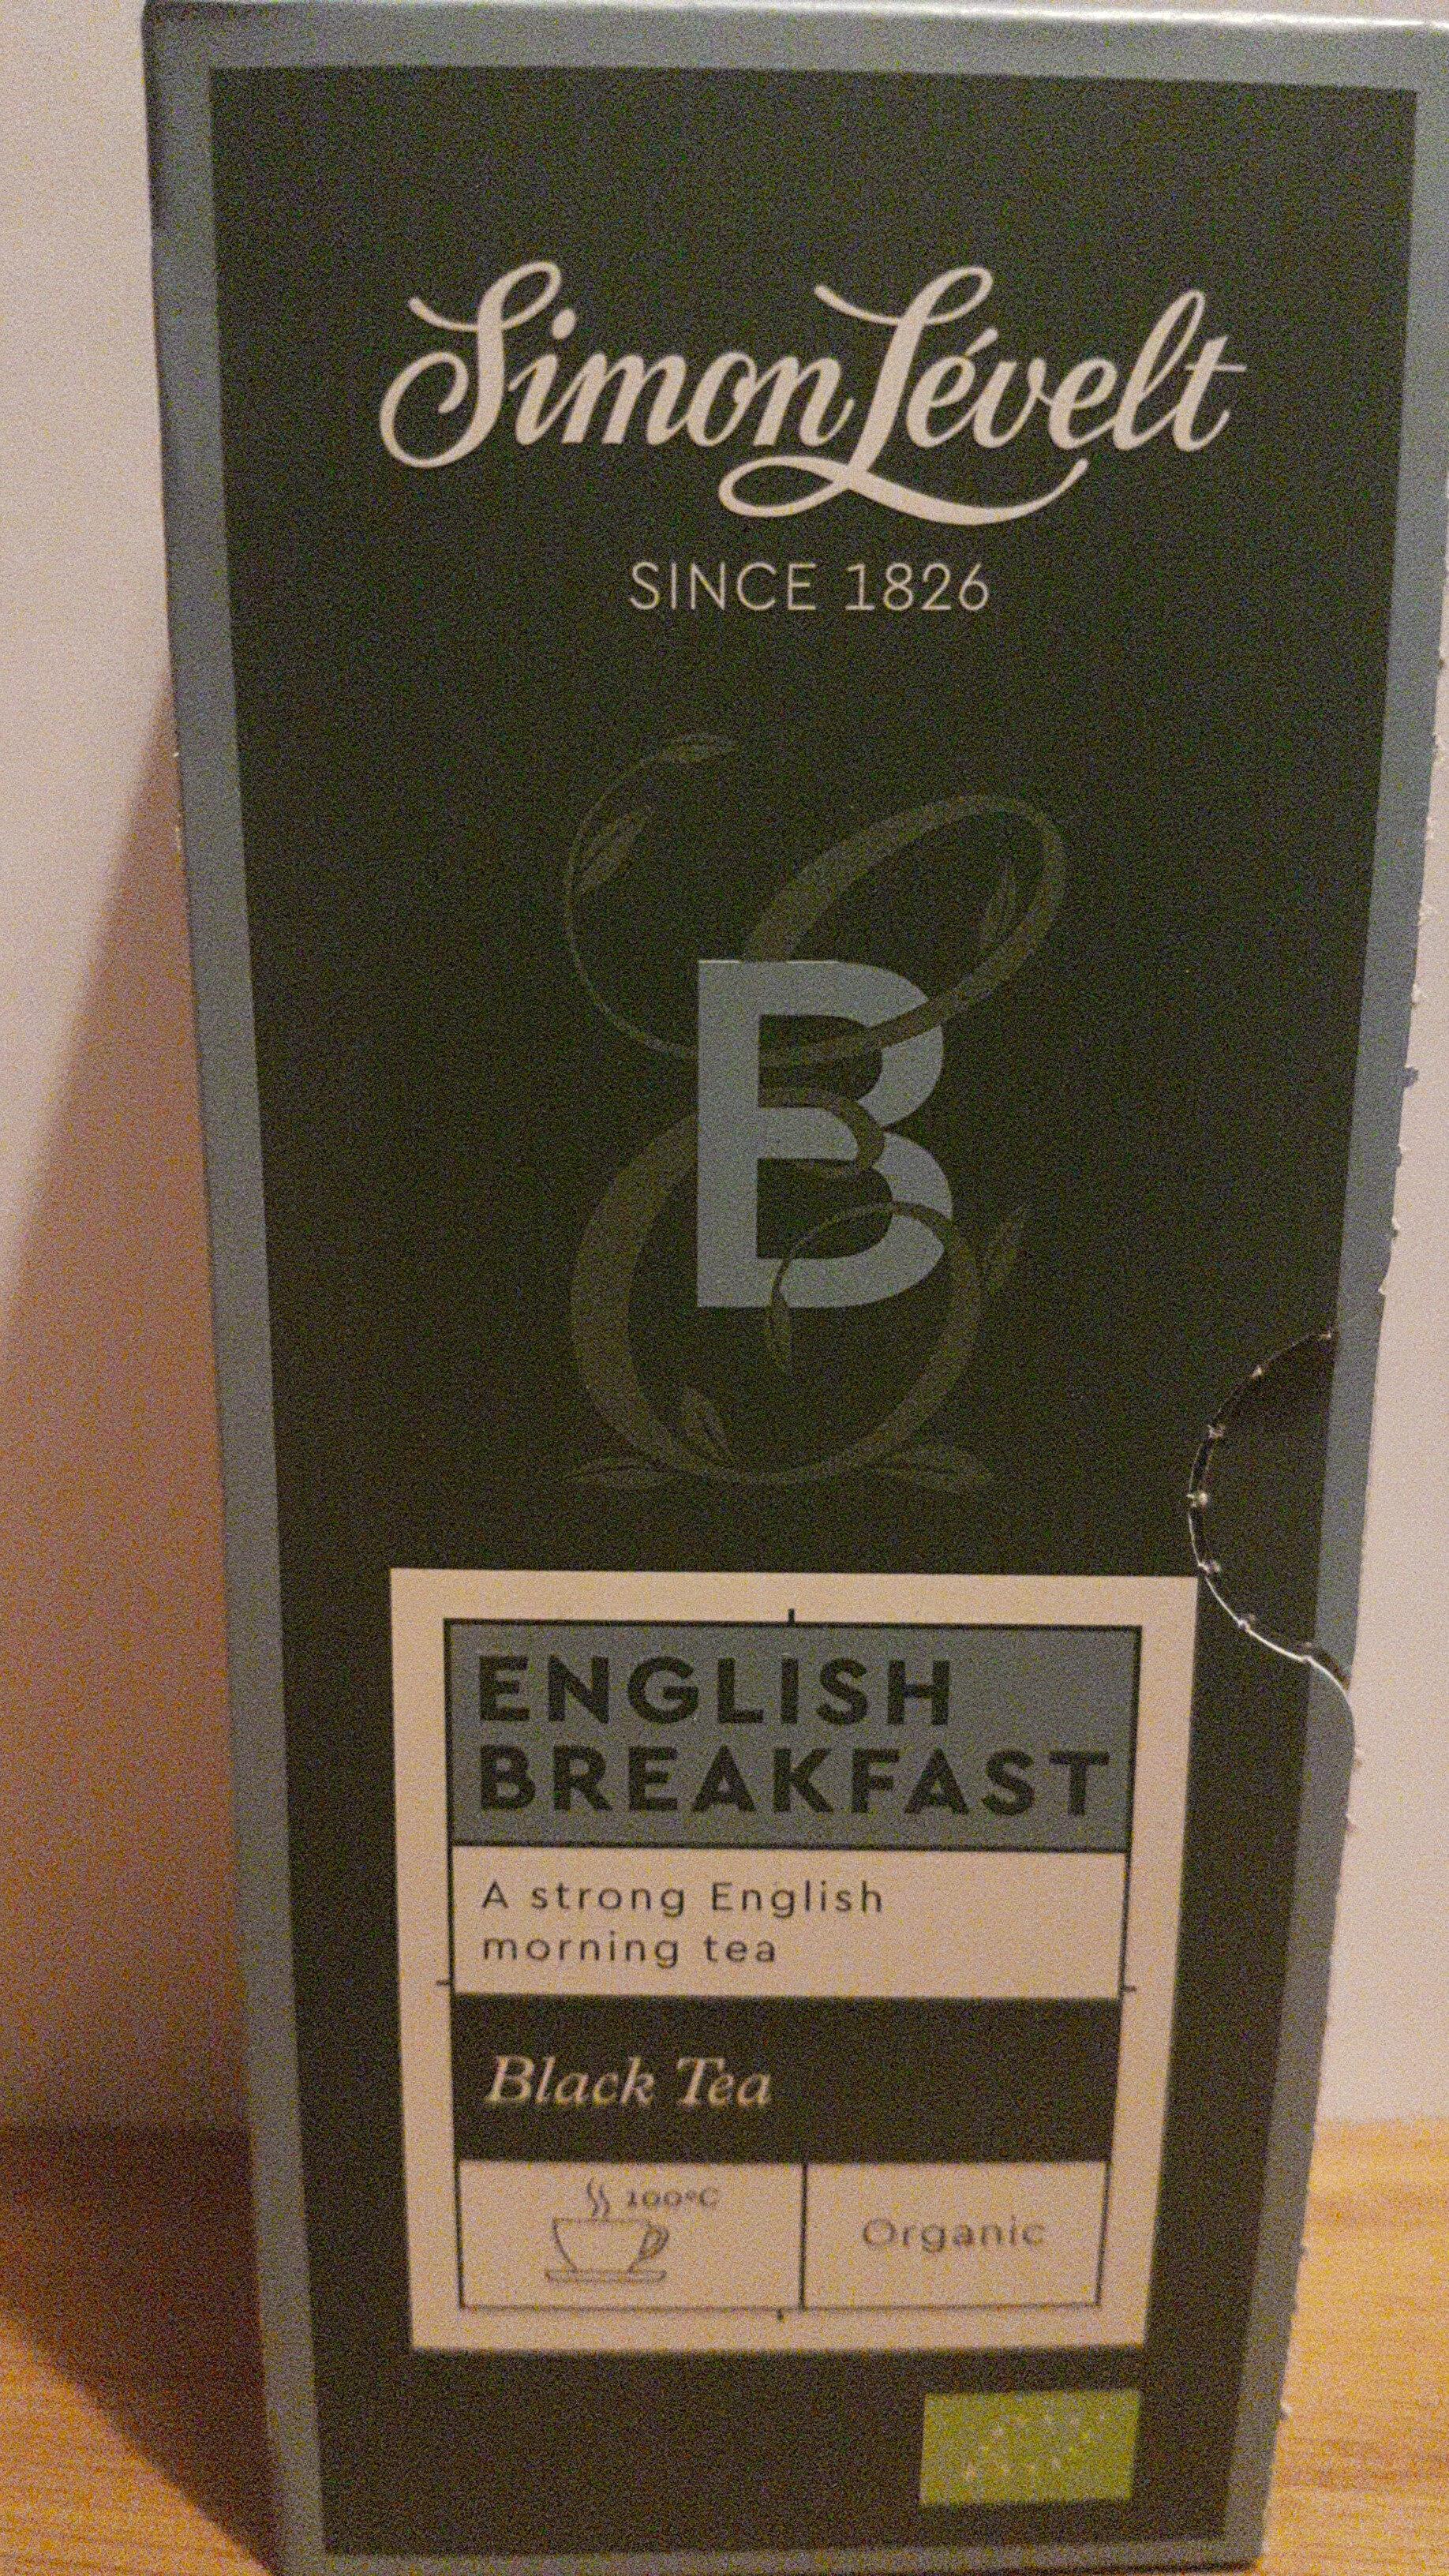 English breakfast - Black tea - Product - en